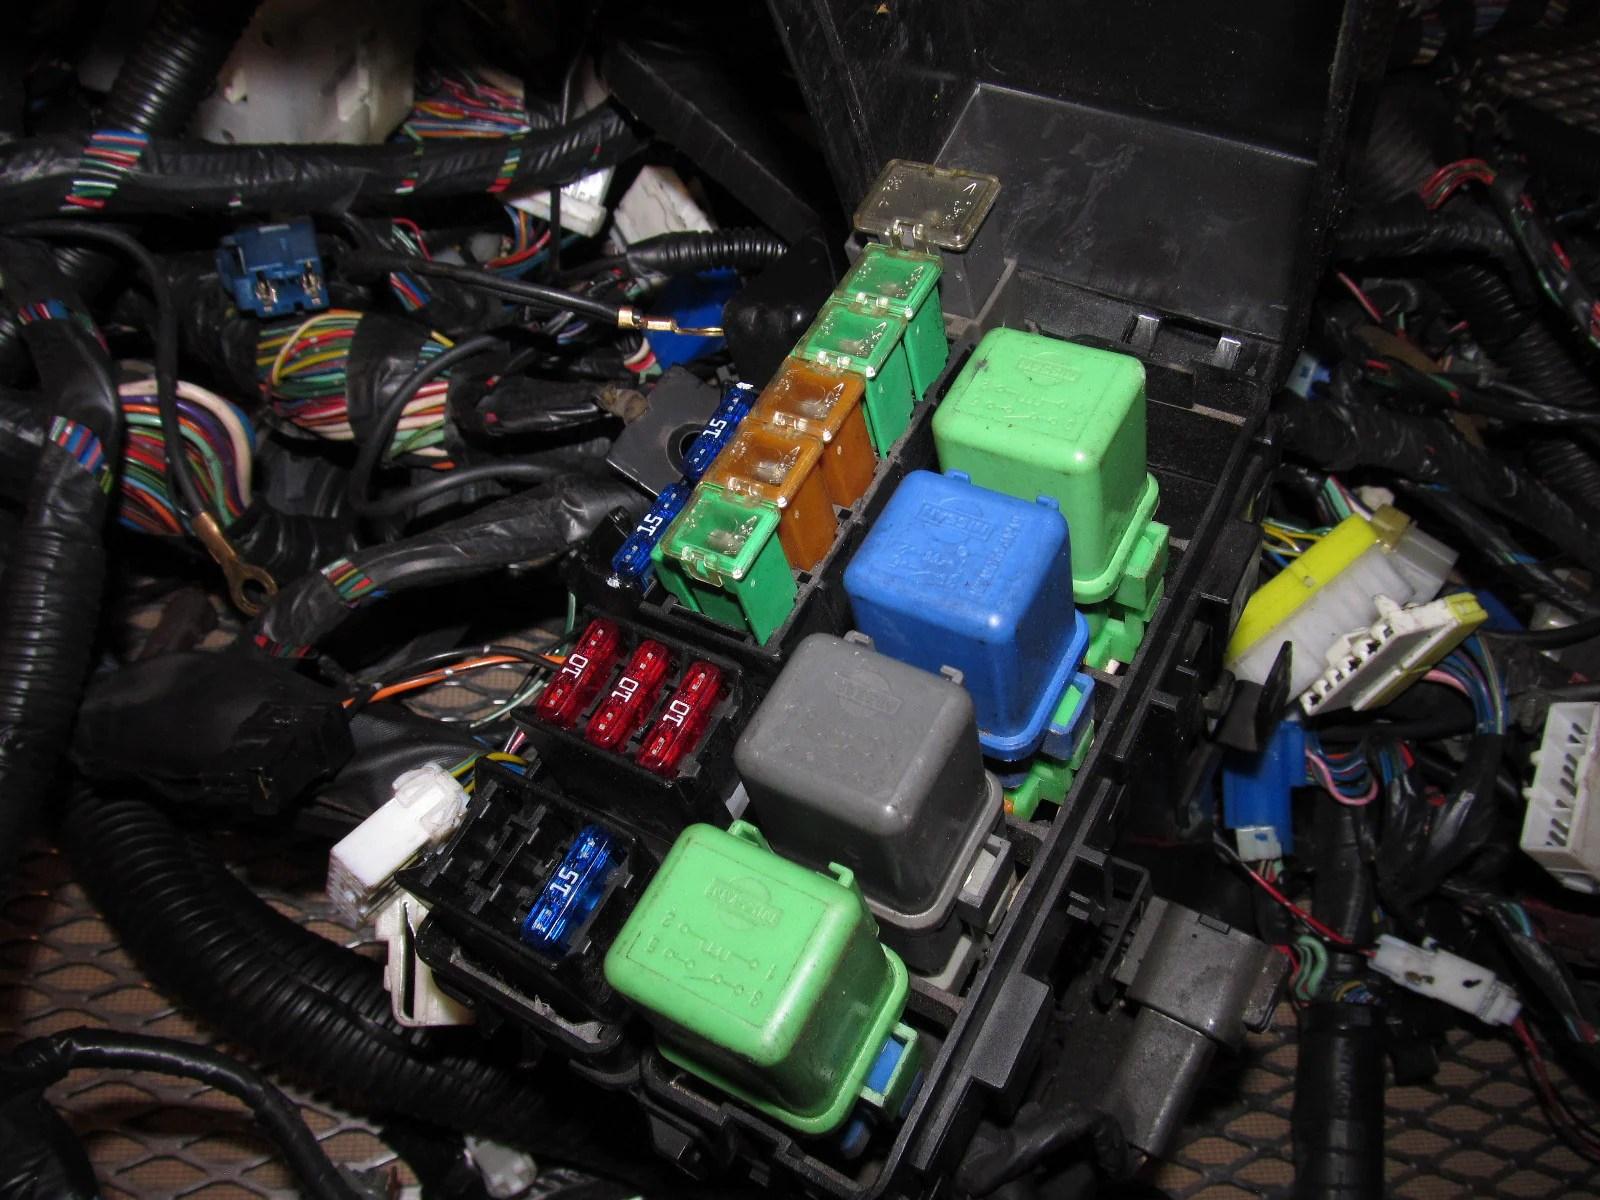 240sx battery fuse box wiring diagram ebook240sx battery fuse box [ 1600 x 1200 Pixel ]